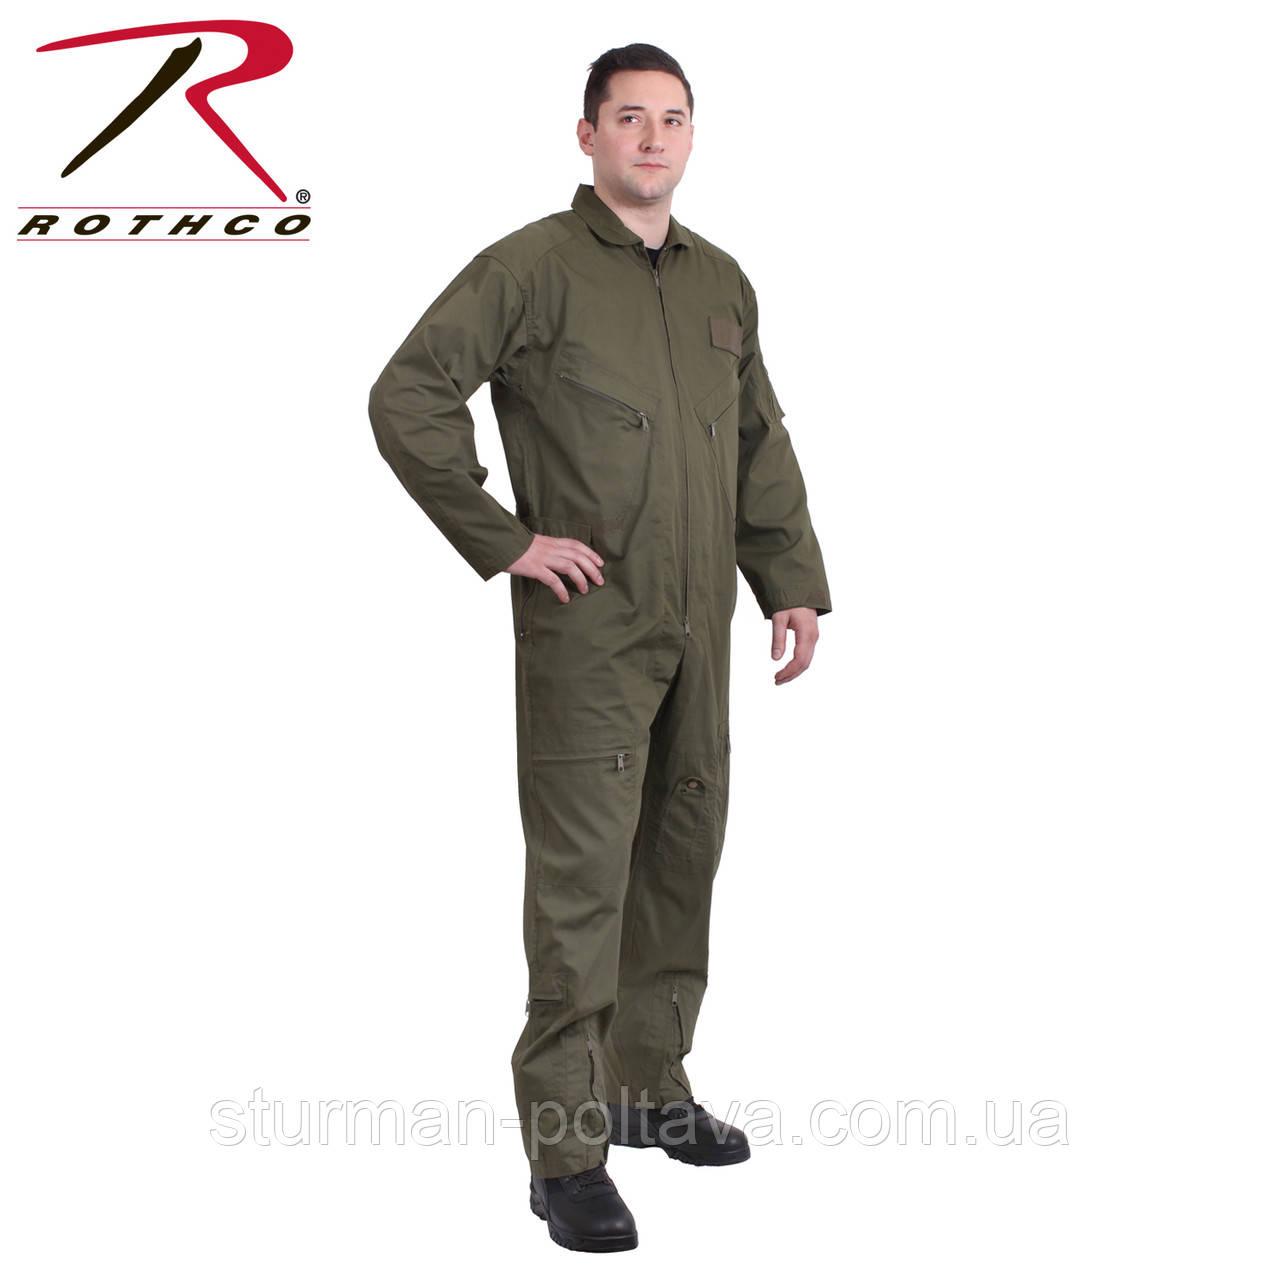 Комбинезон лётчика  ВВС США   AIR FORCE цвет олива   ROTCHO США